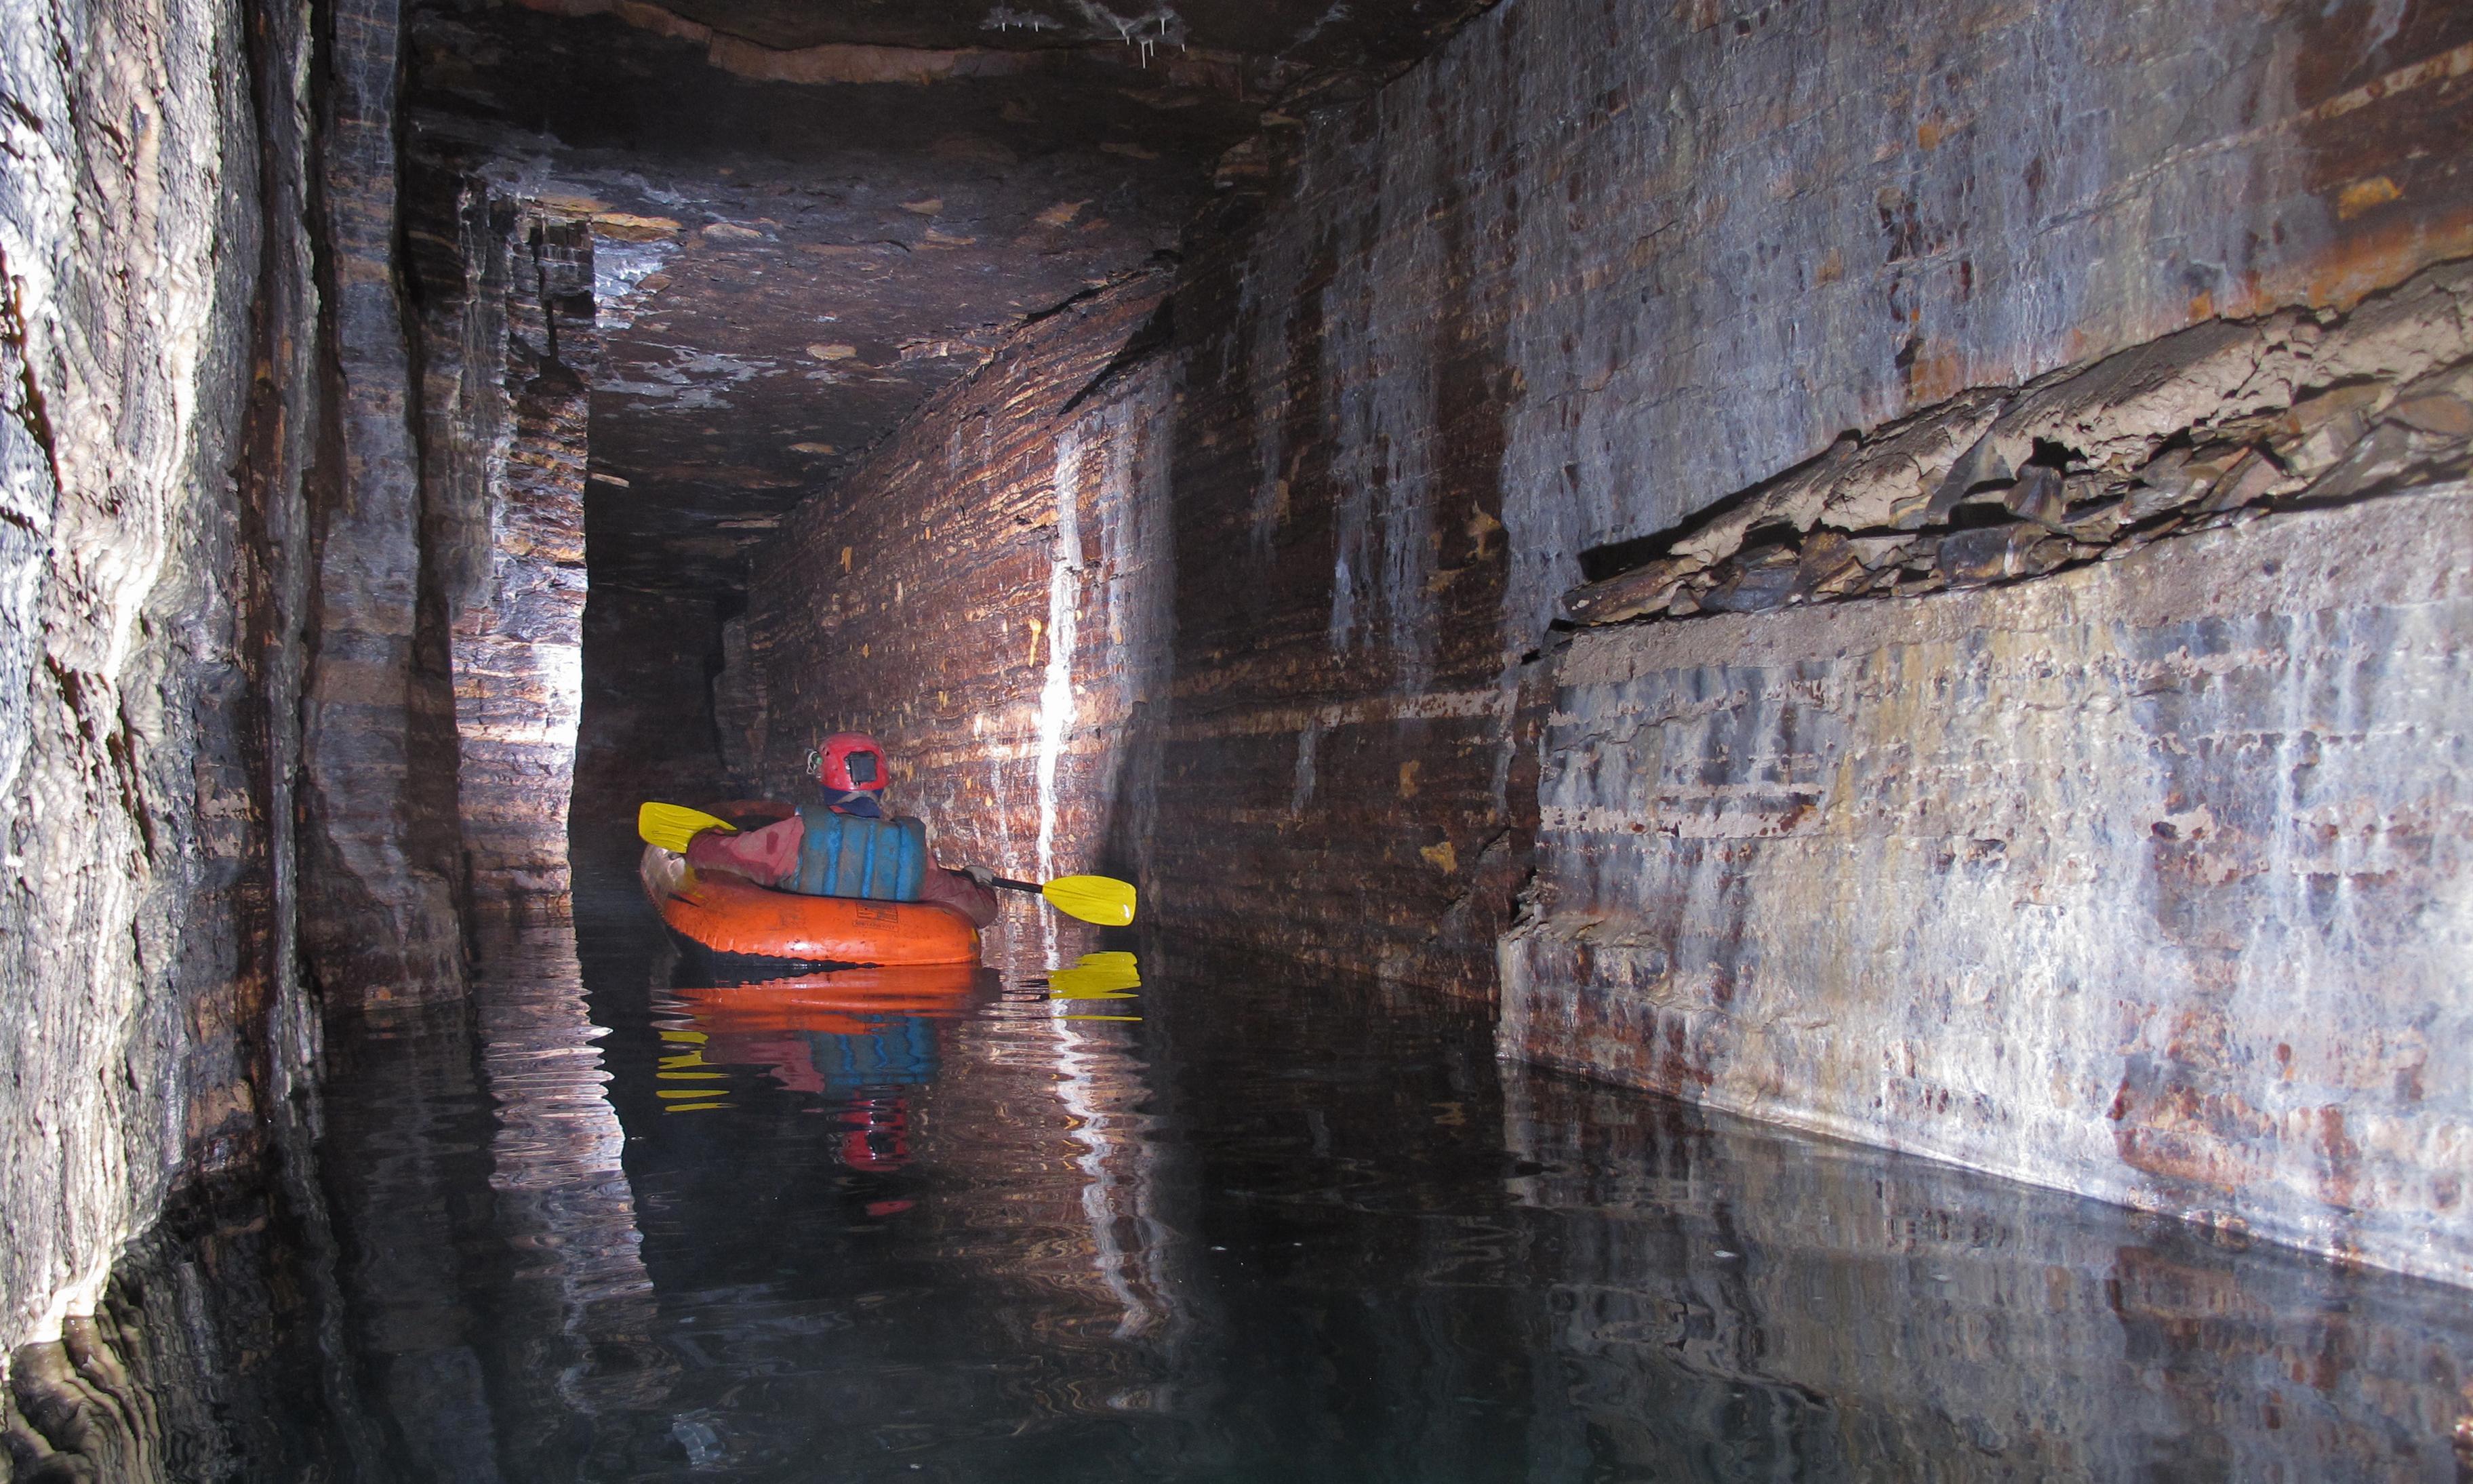 Amateur explorers discover vast underground passage beneath Montreal